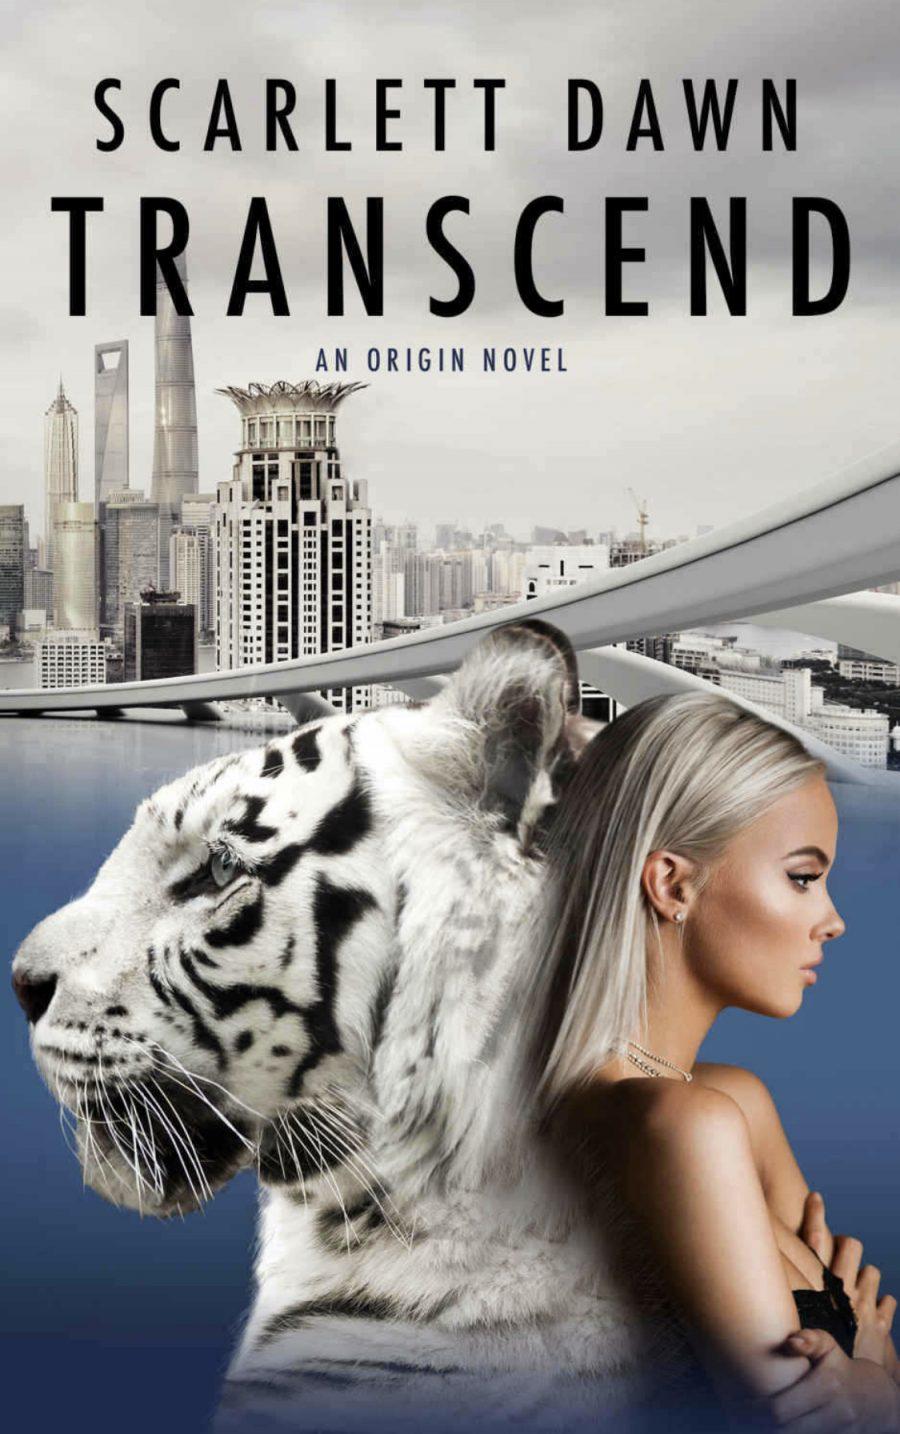 Transcend by Scarlett Dawn - A Book Review #BookReview #OlderRelease #FantasyRomance #Dystopian #Shifter #4Stars #KindleUnlimited #KU